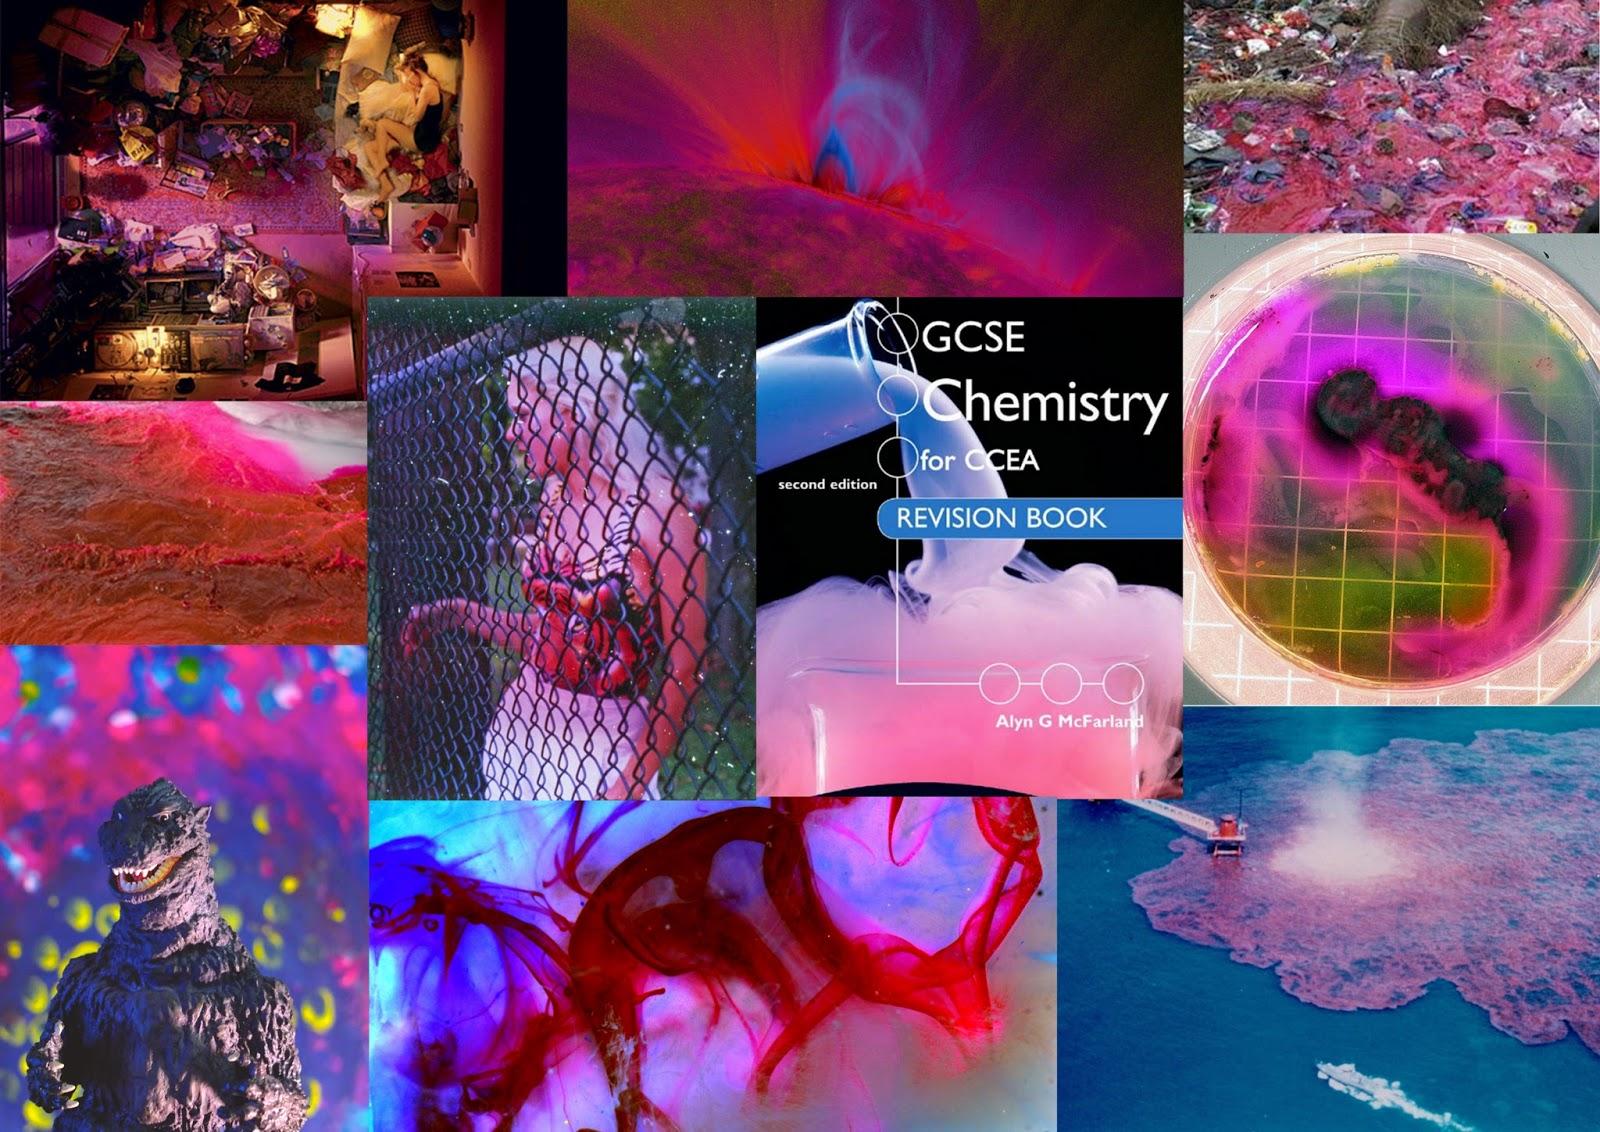 Lucy e Hardcastle: Mood Board Developments ~ Space Invasion SS14: lucyehardcastle.blogspot.com/2013/10/mood-board-developments-space...